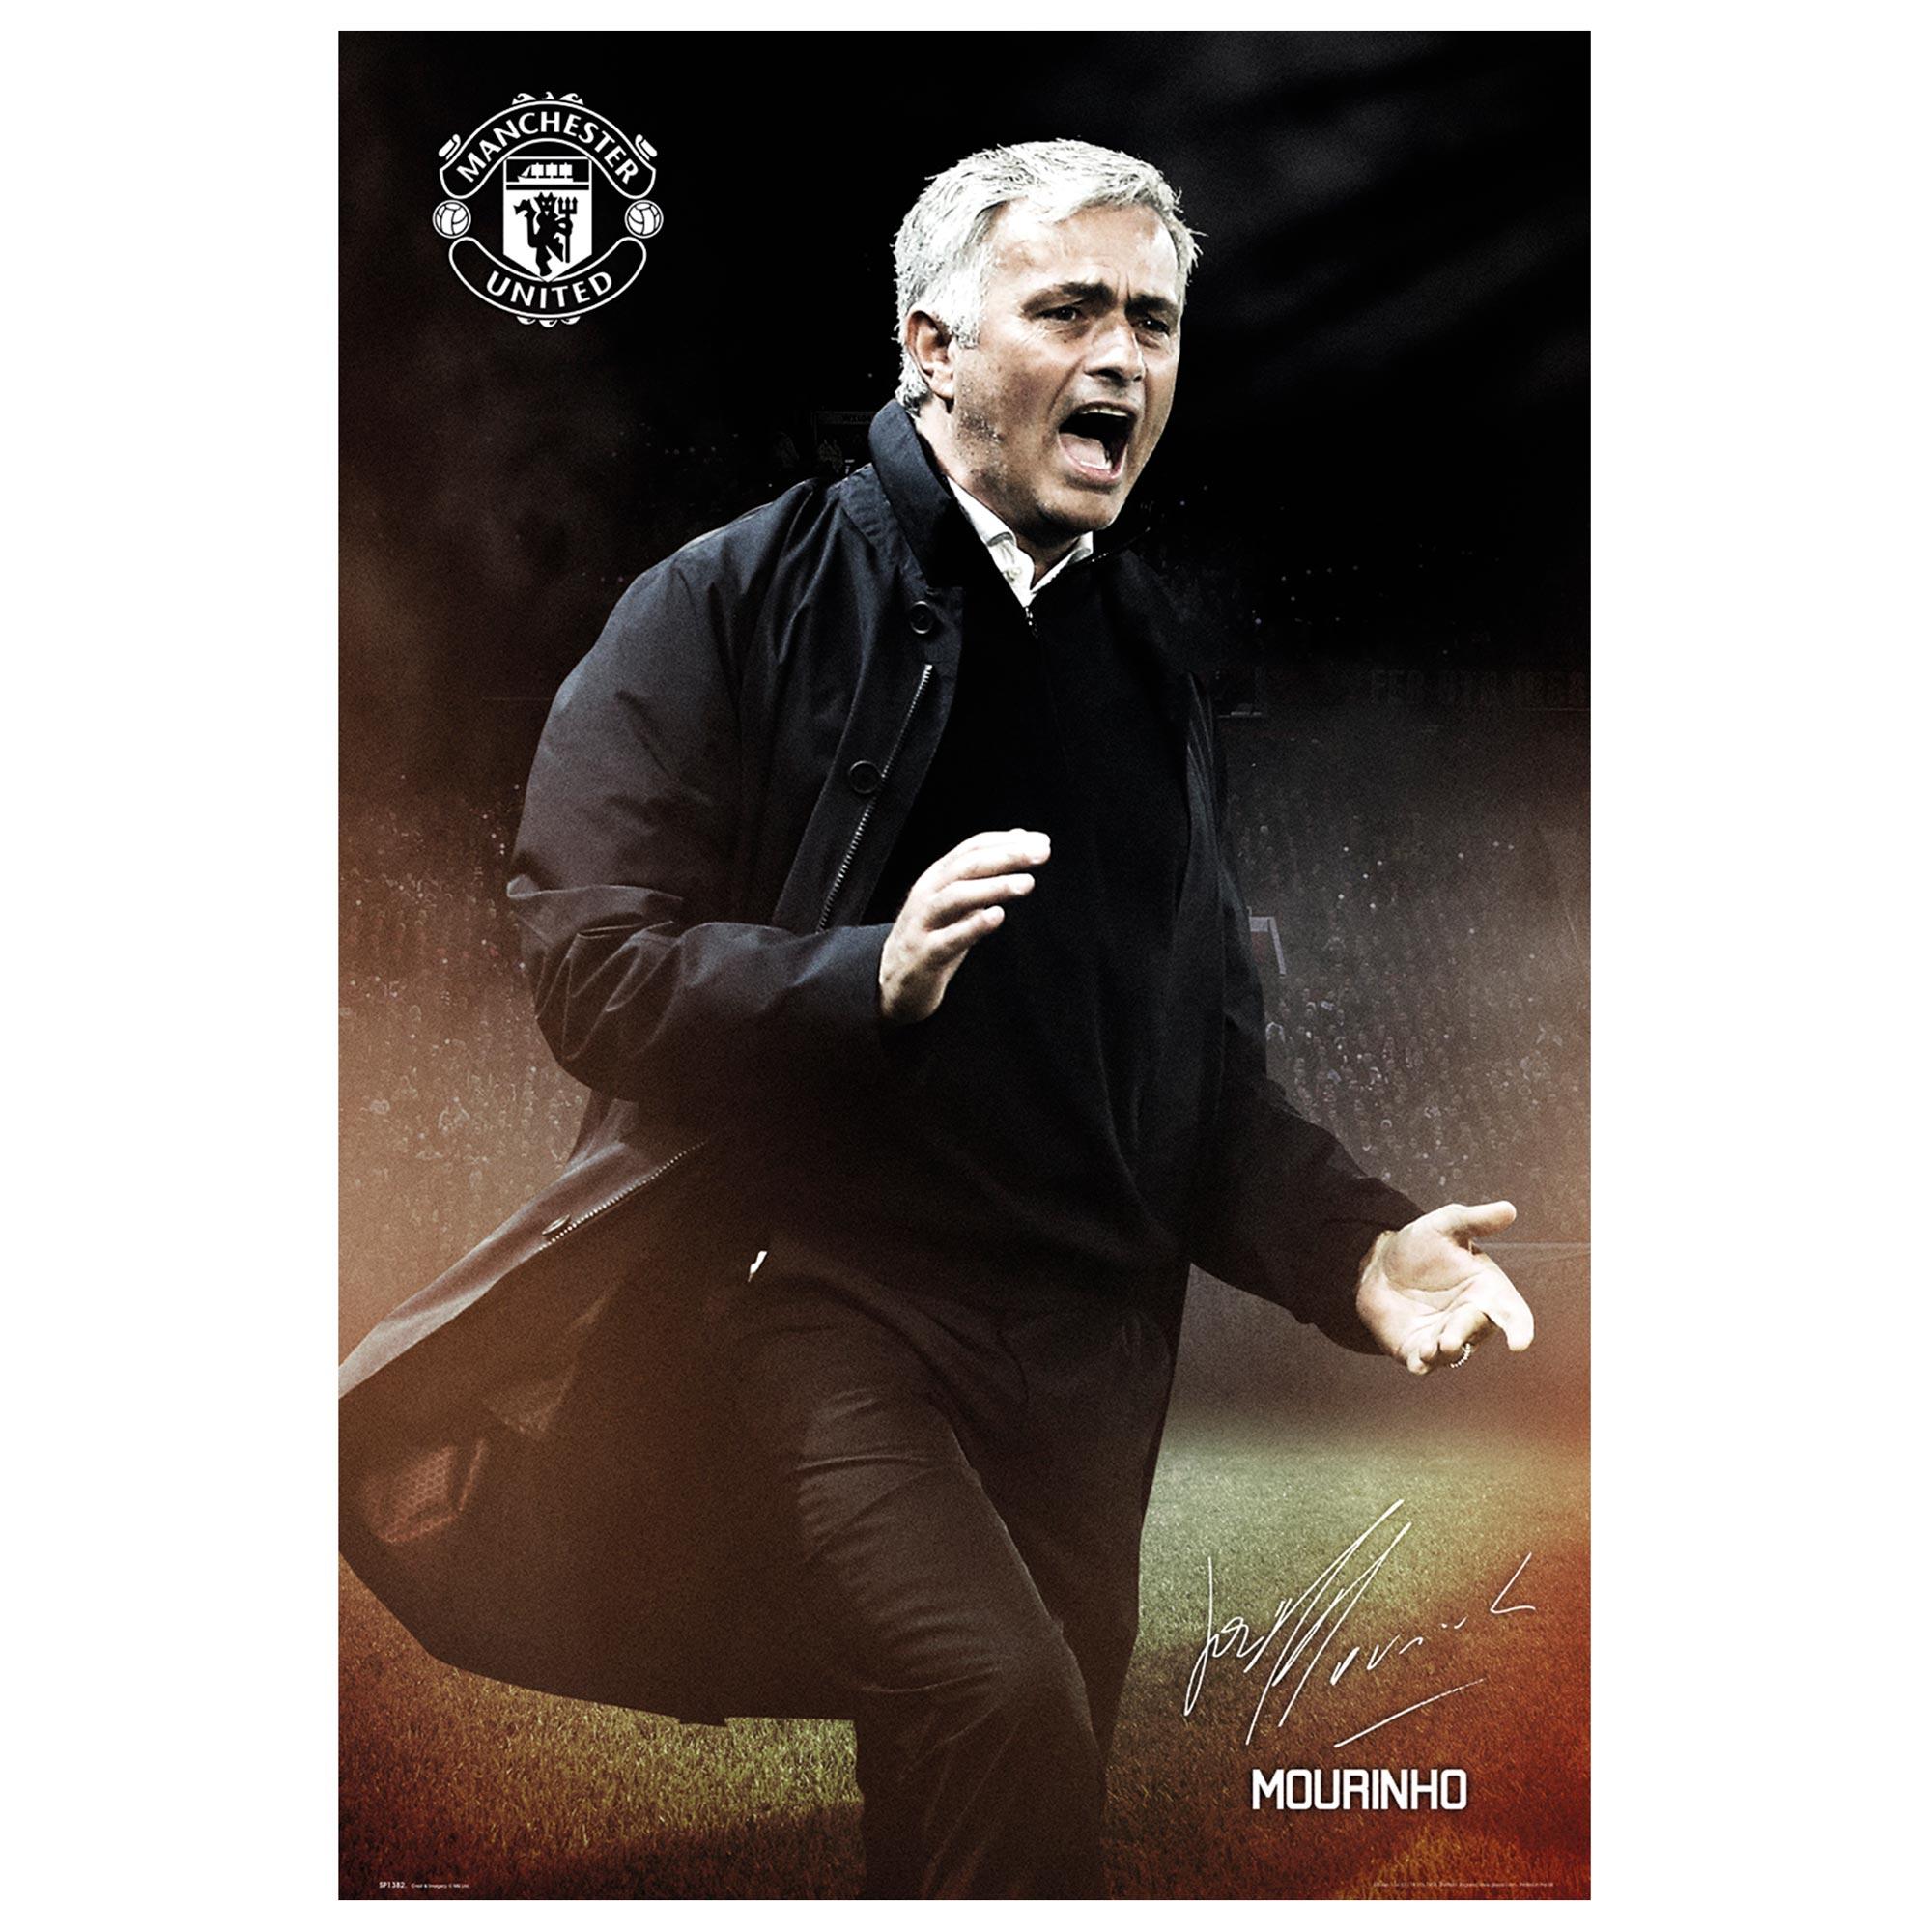 Manchester United Mourinho Poster - 61 x 92cm